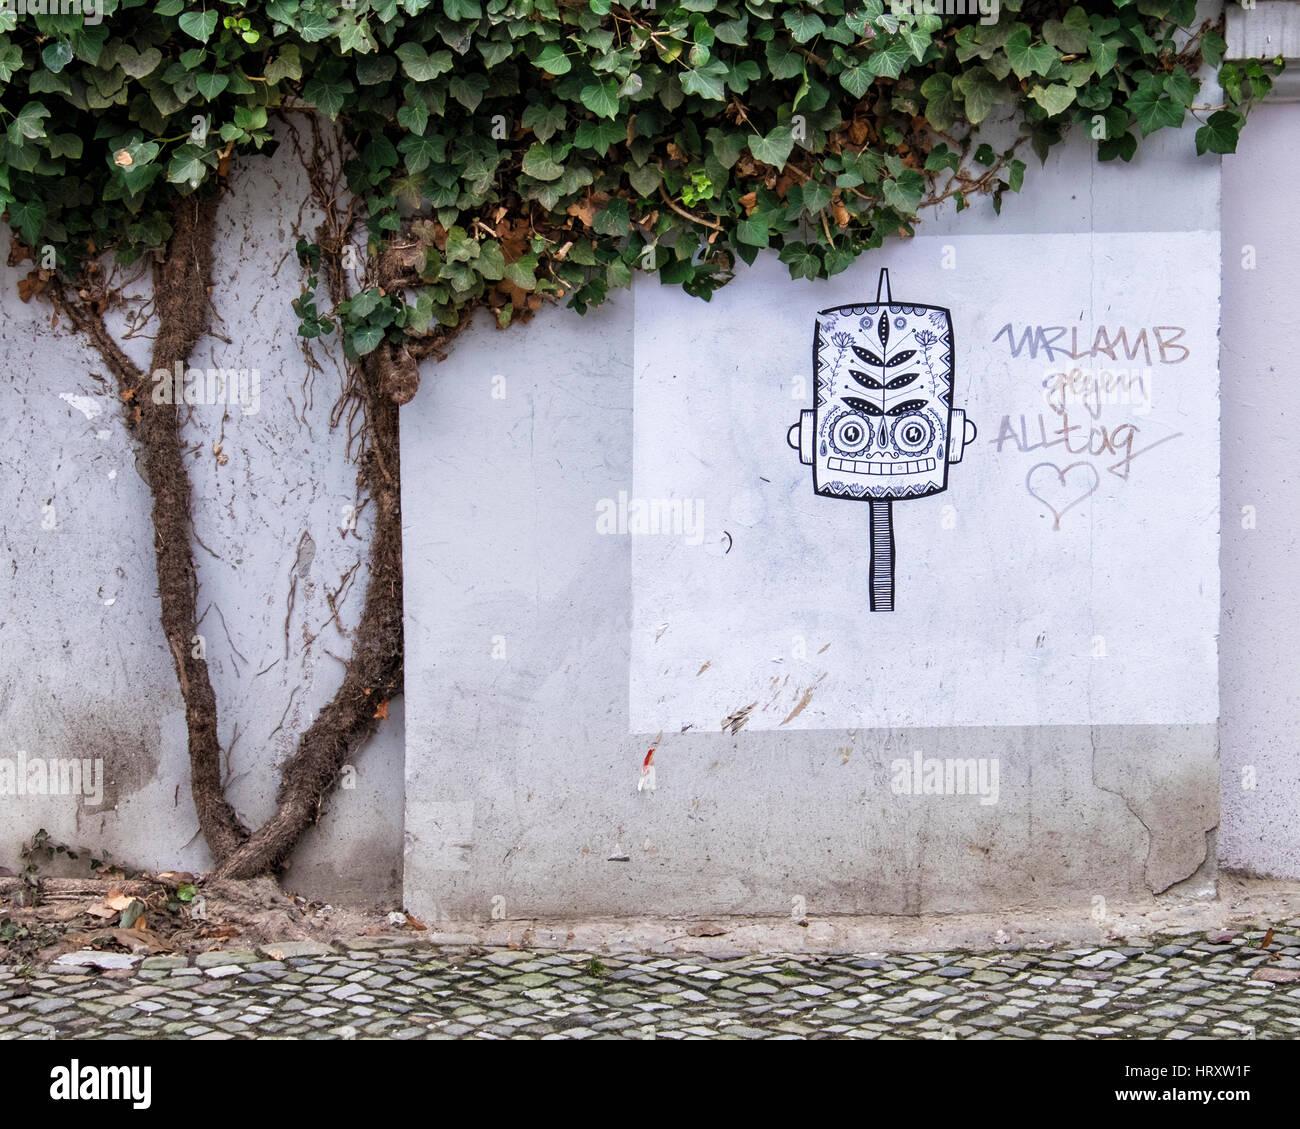 Berlin, Prenzlauer Berg..Street art. pattern face and 'Urlaub gegen Alltag' meaning 'holiday against - Stock Image